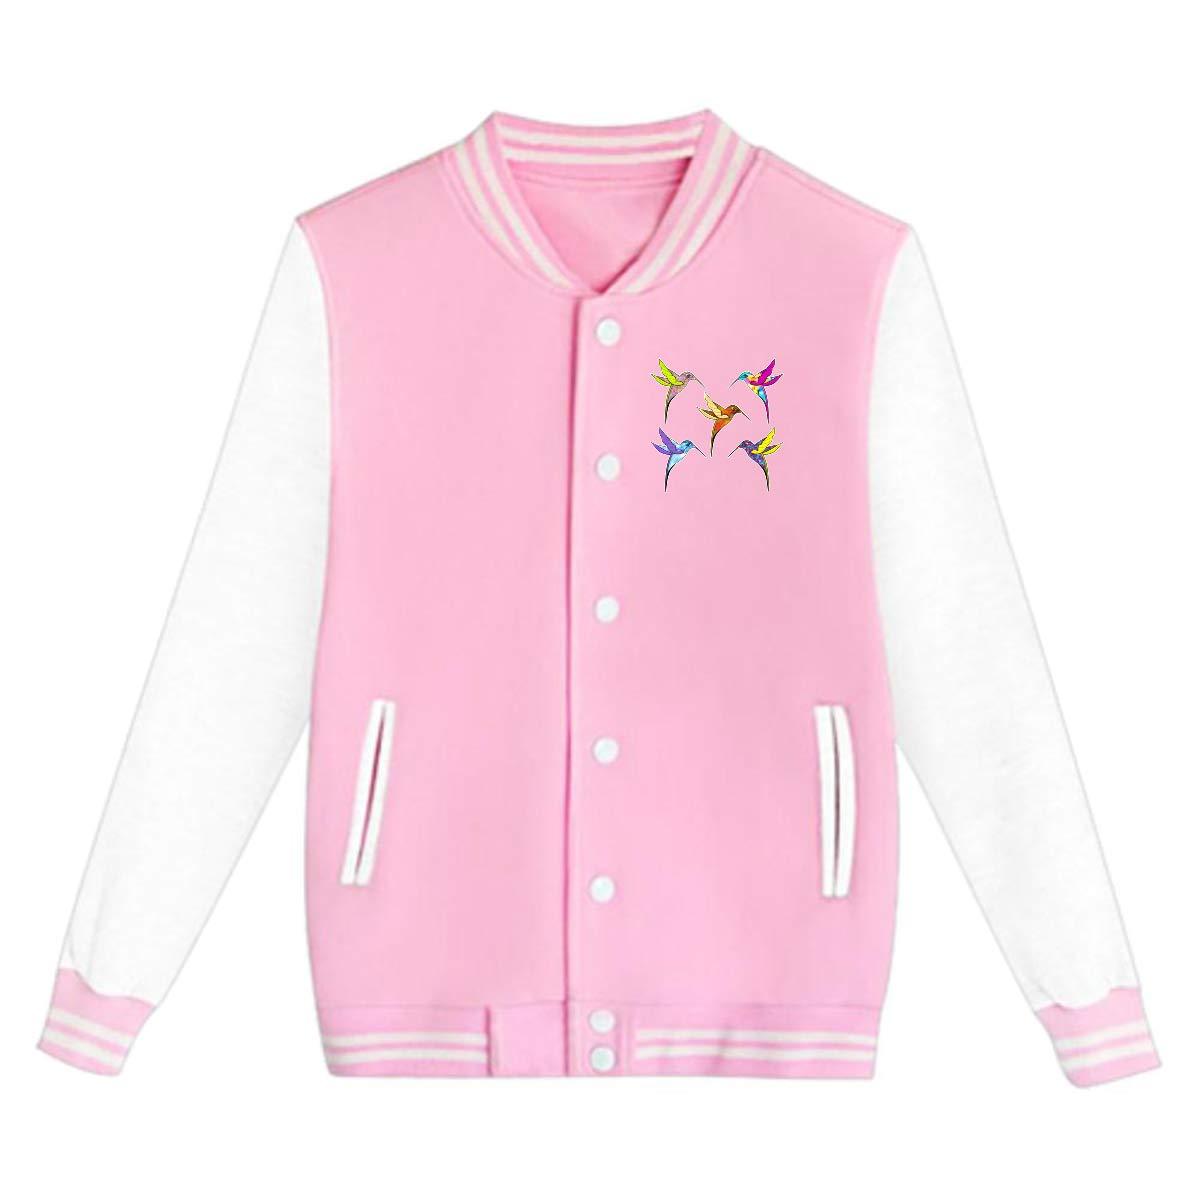 Tina TN Colorful Flying Hummingbirds Teens Boys Girl Varsity Baseball Jacket Long Sleeve Sport Baseball Uniform Jacket Coat Sweater Black